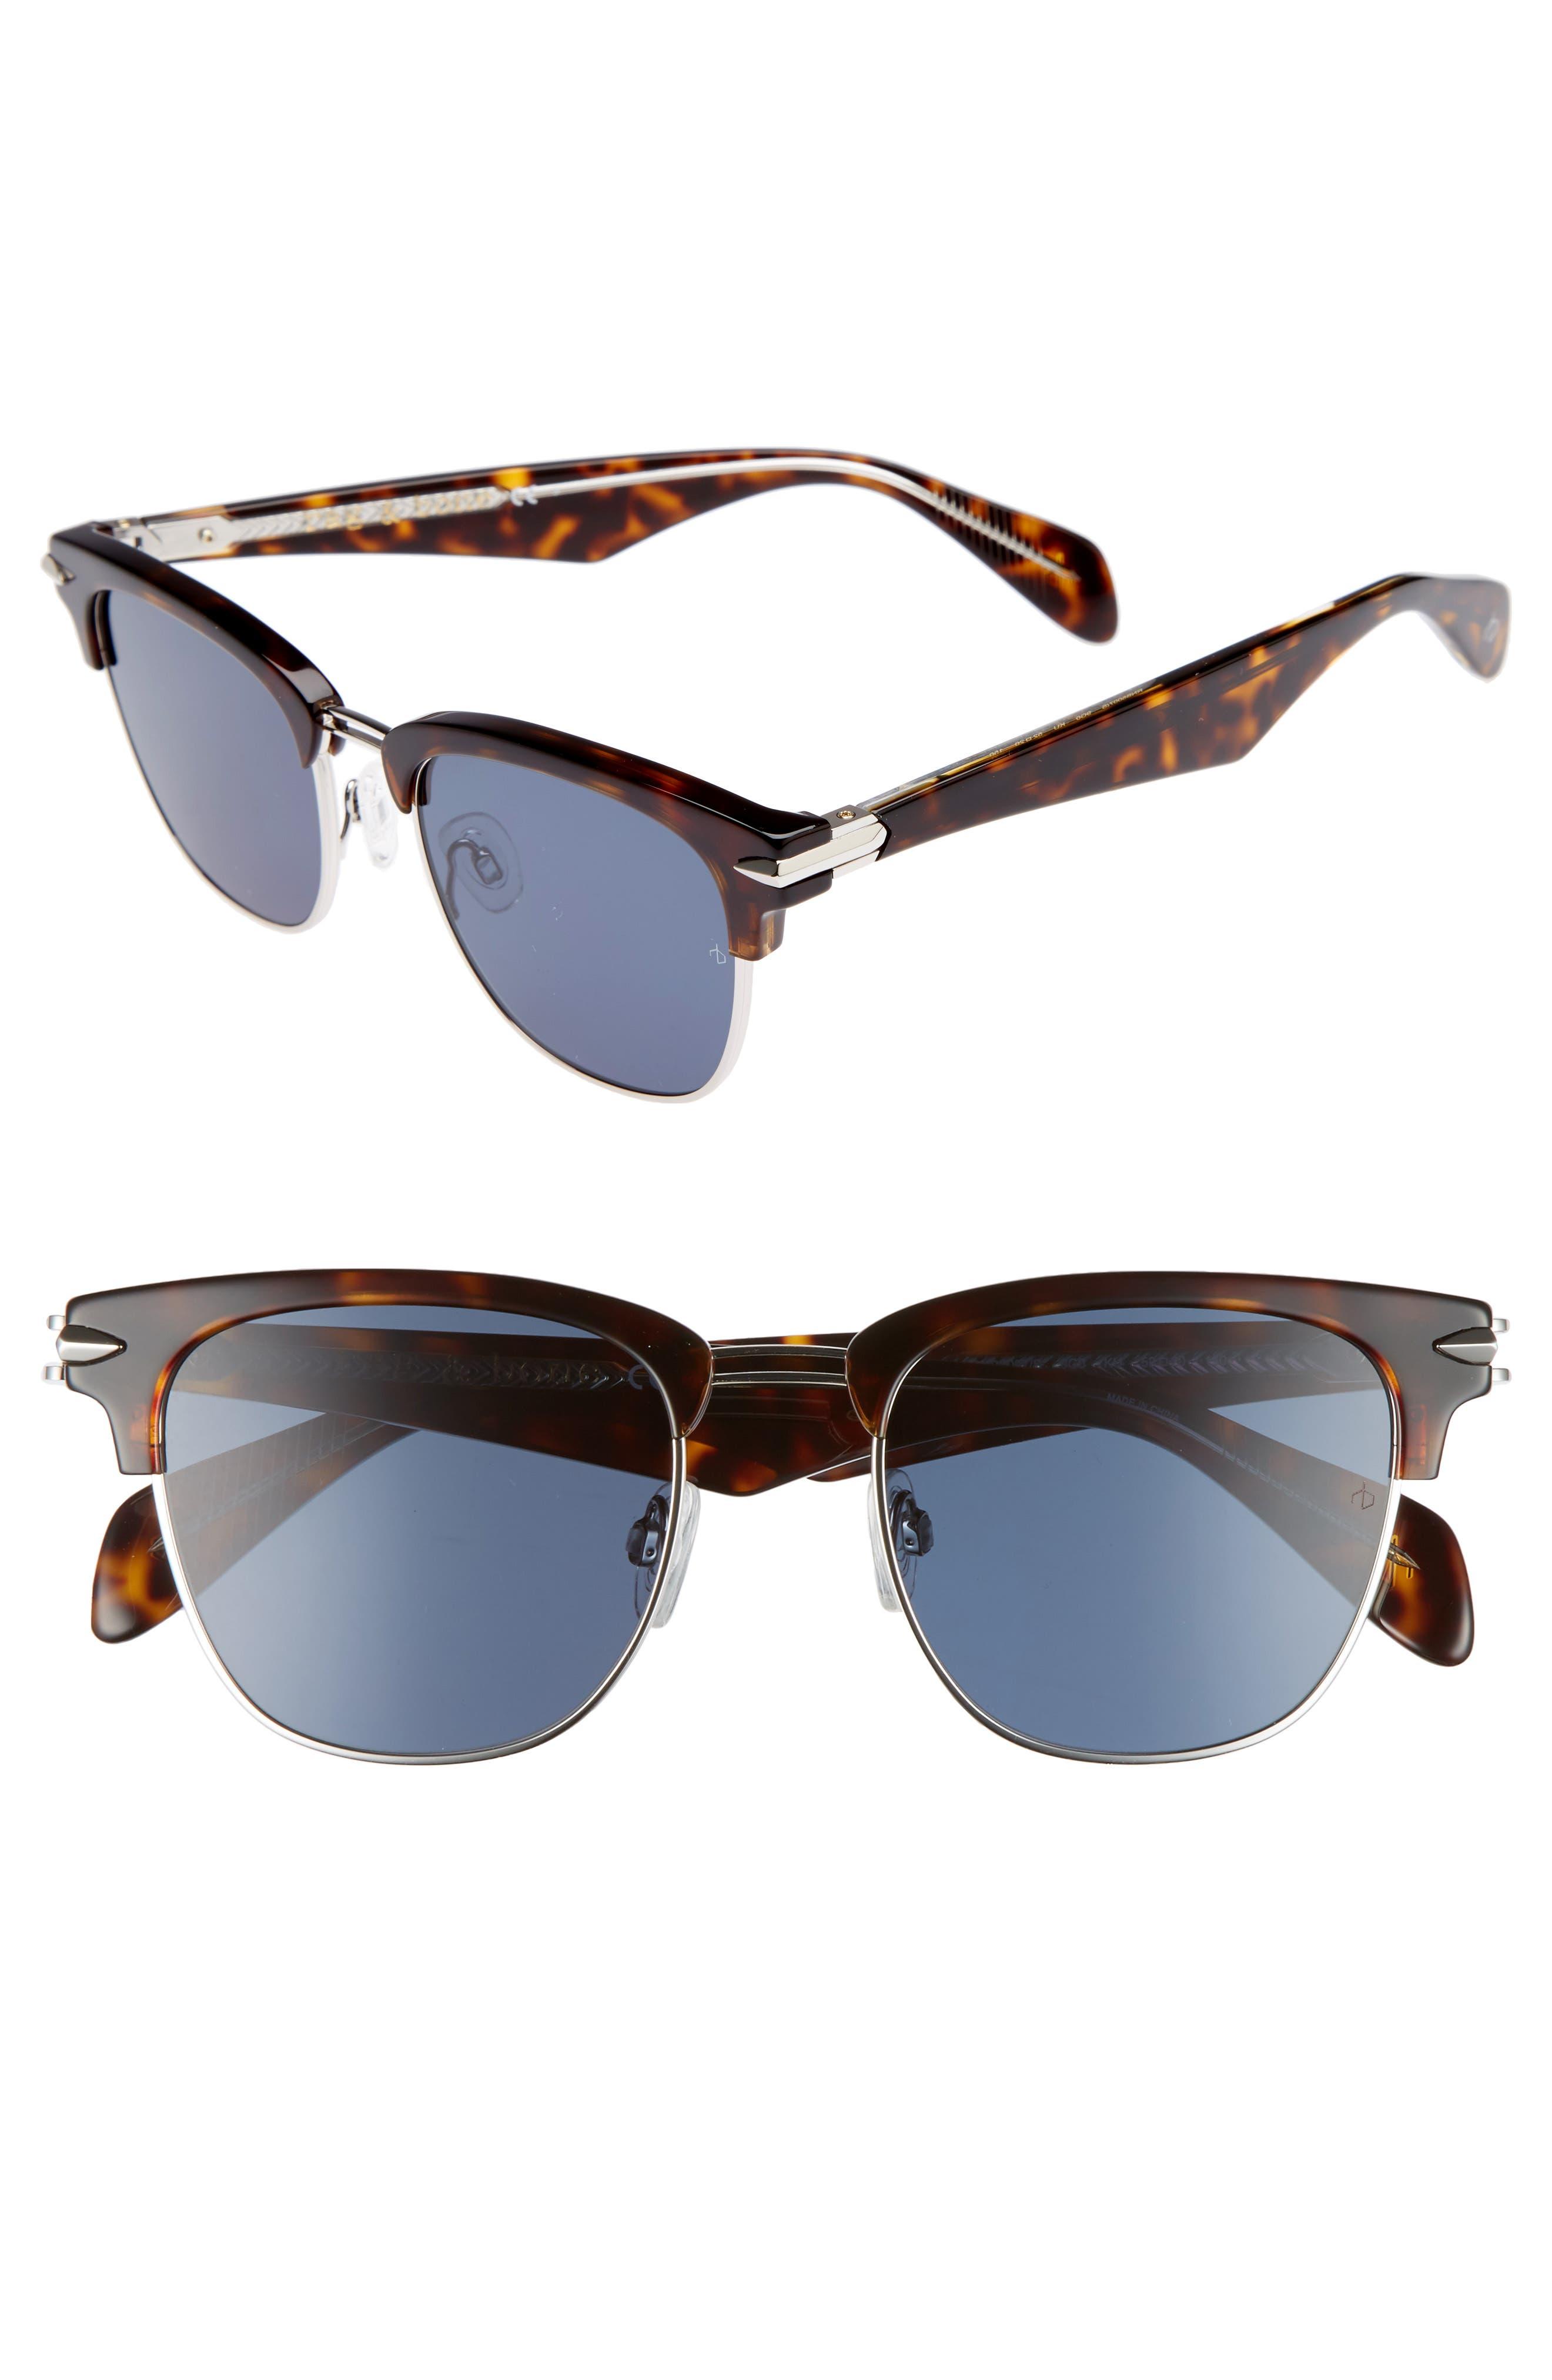 52mm Sunglasses,                         Main,                         color, HAVANA PALLADIUM